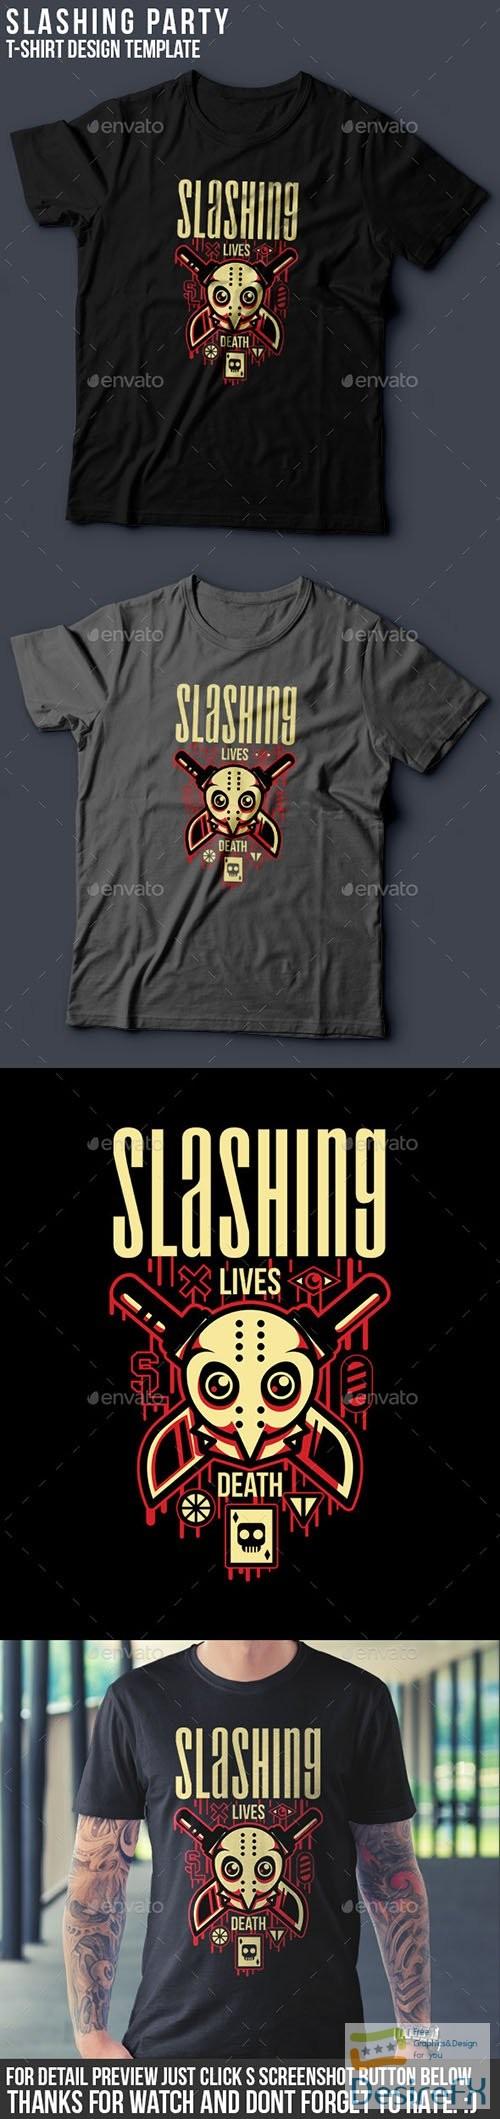 t-shirts-prints - Slashing Party T-Shirt Design 15143026